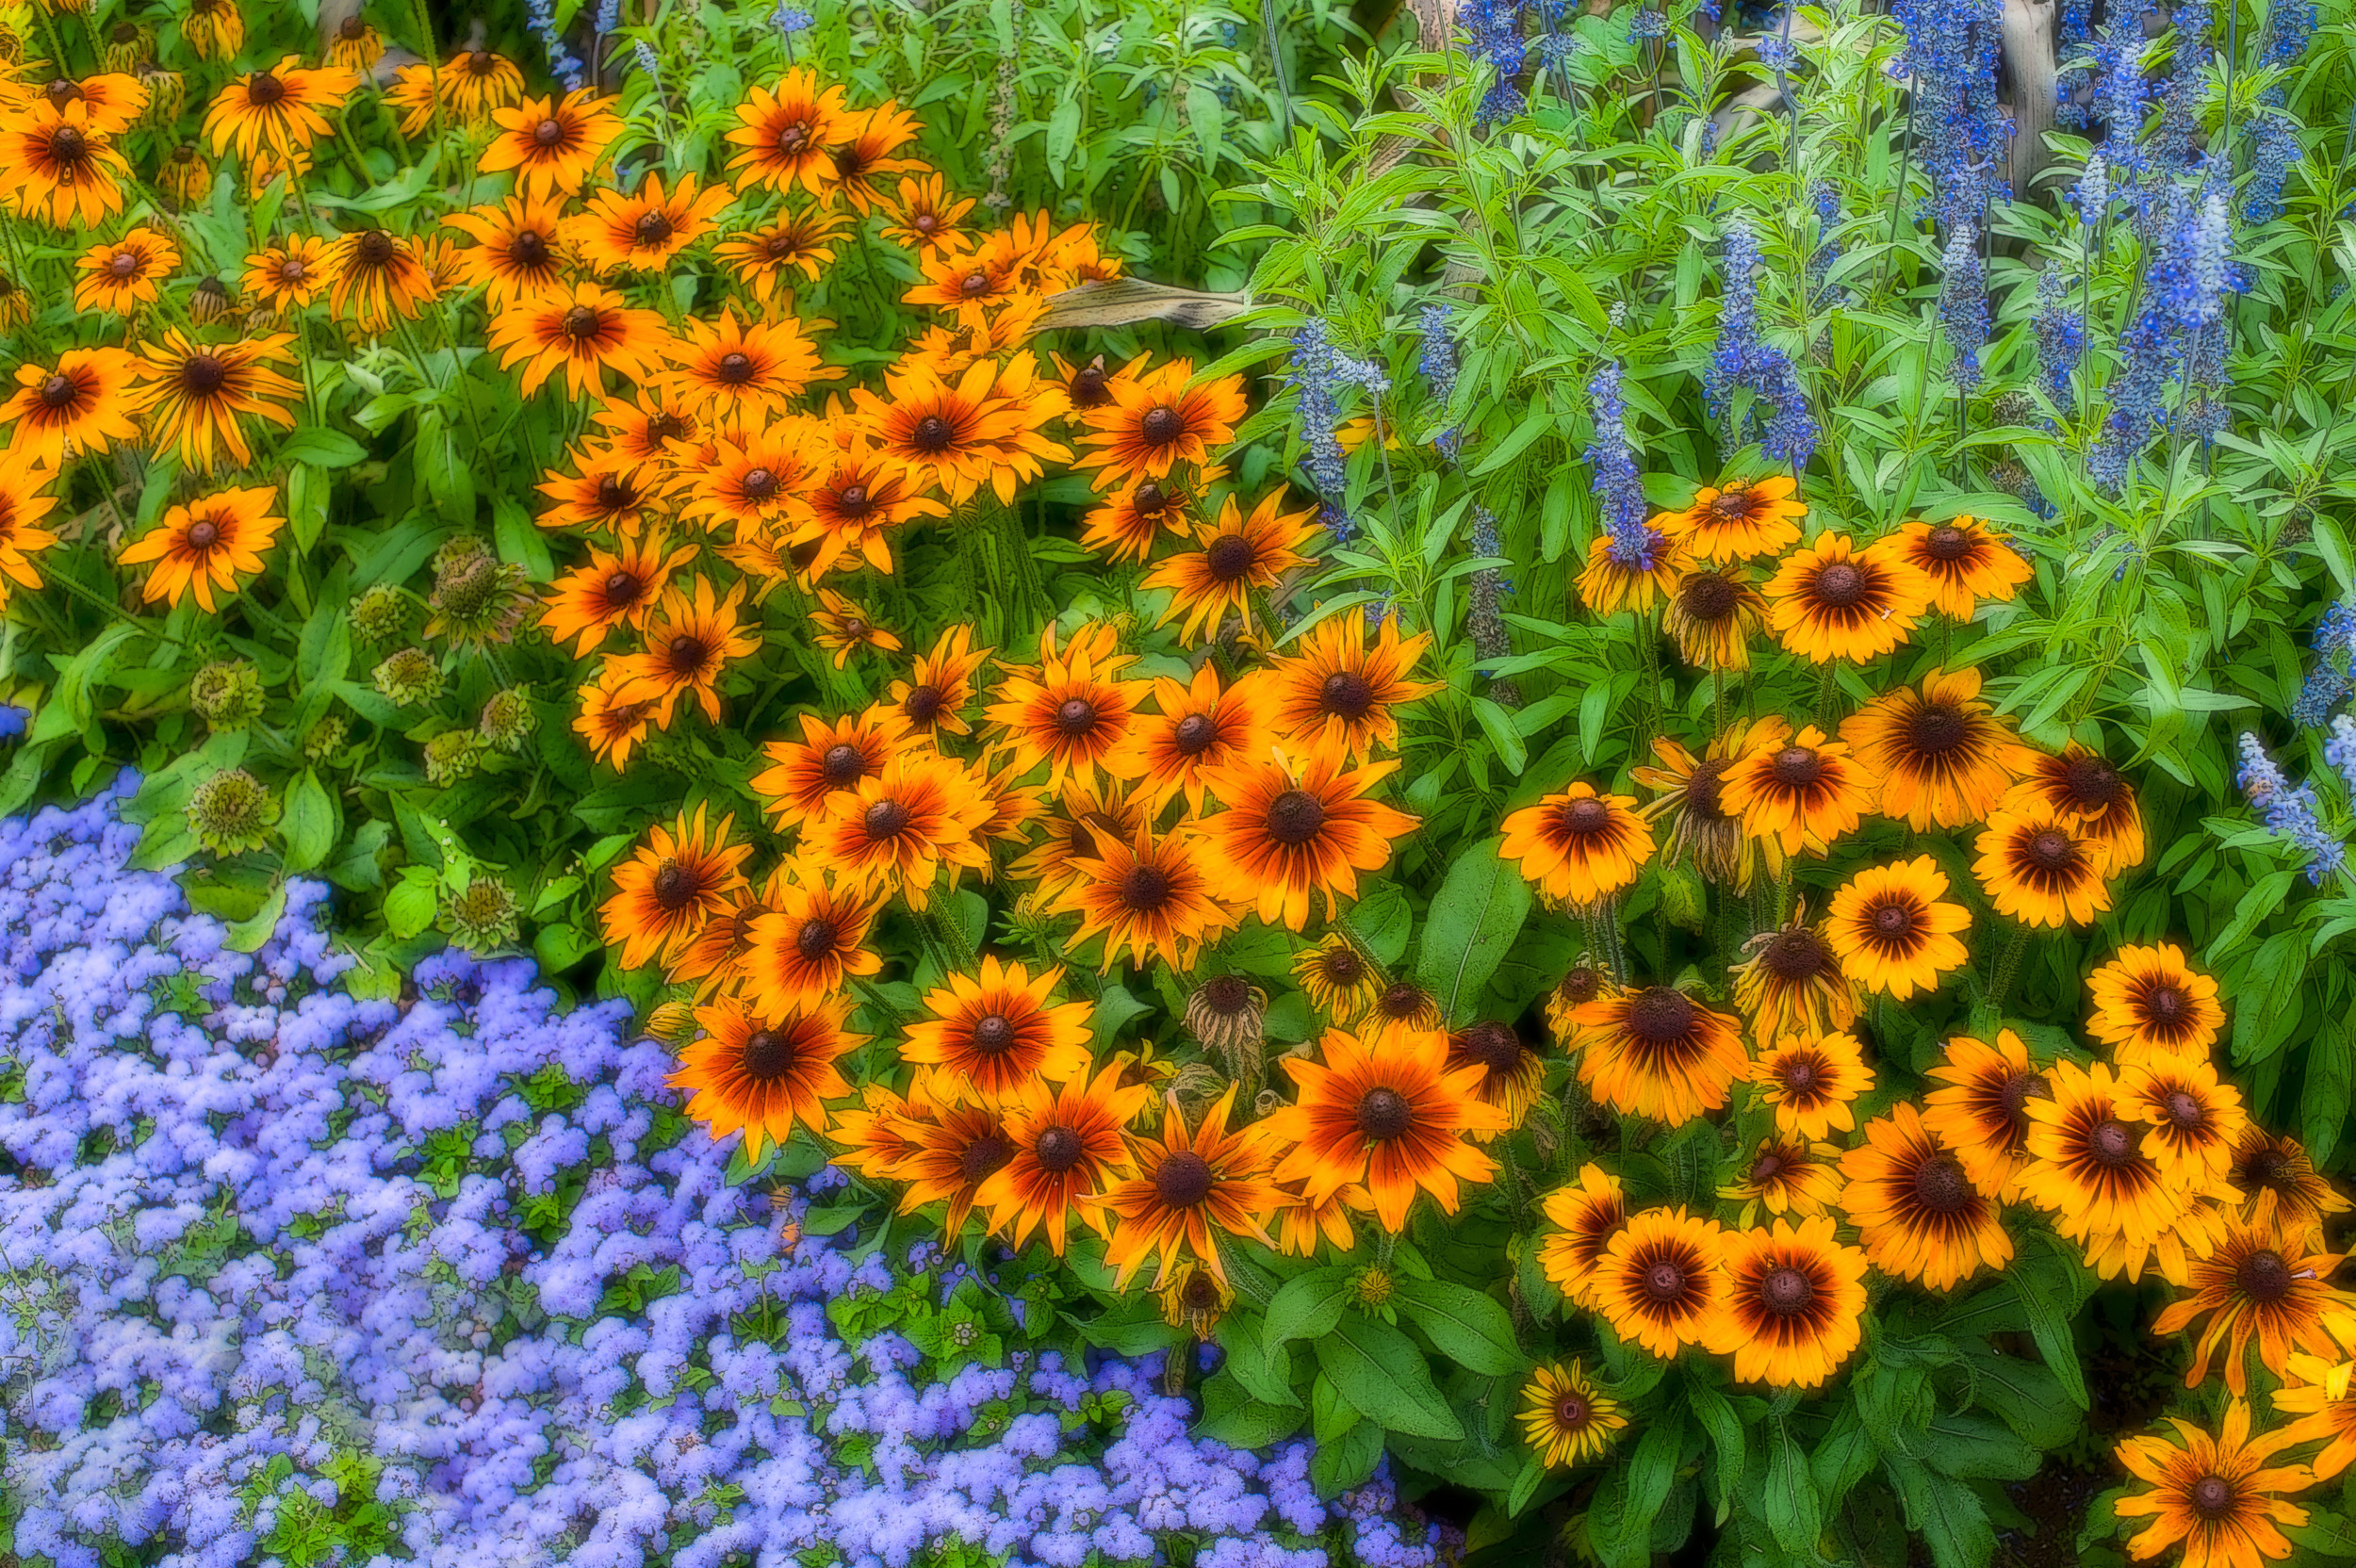 11-910 Fall flower garden_DSC1384.jpg